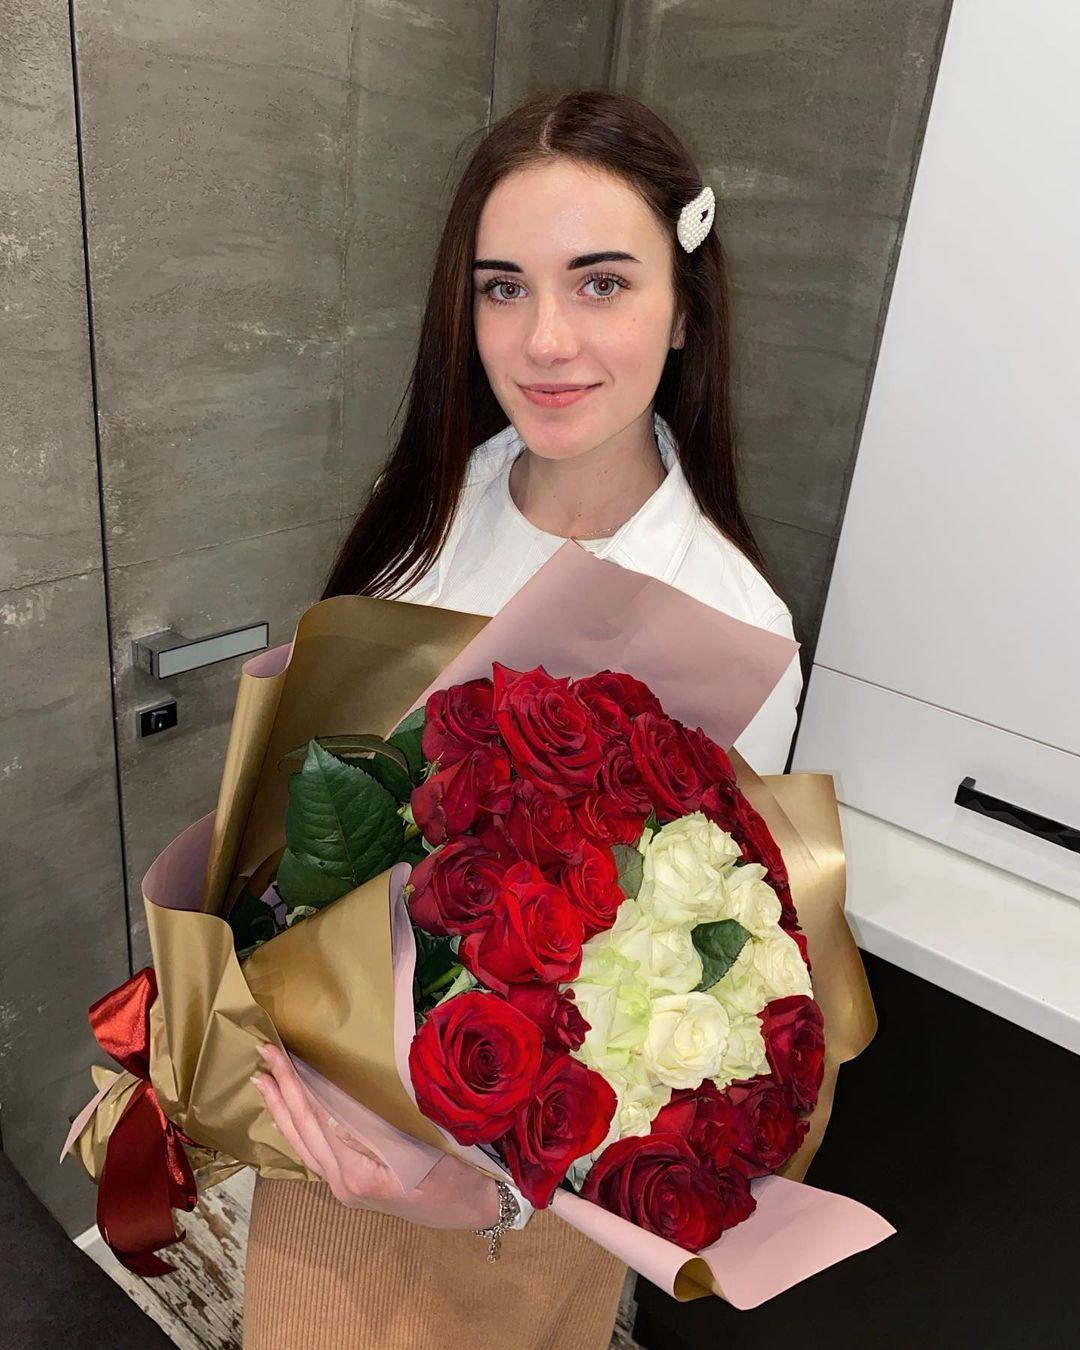 Anya-Desyatnikova-Wallpapers-Insta-Fit-Bio-18